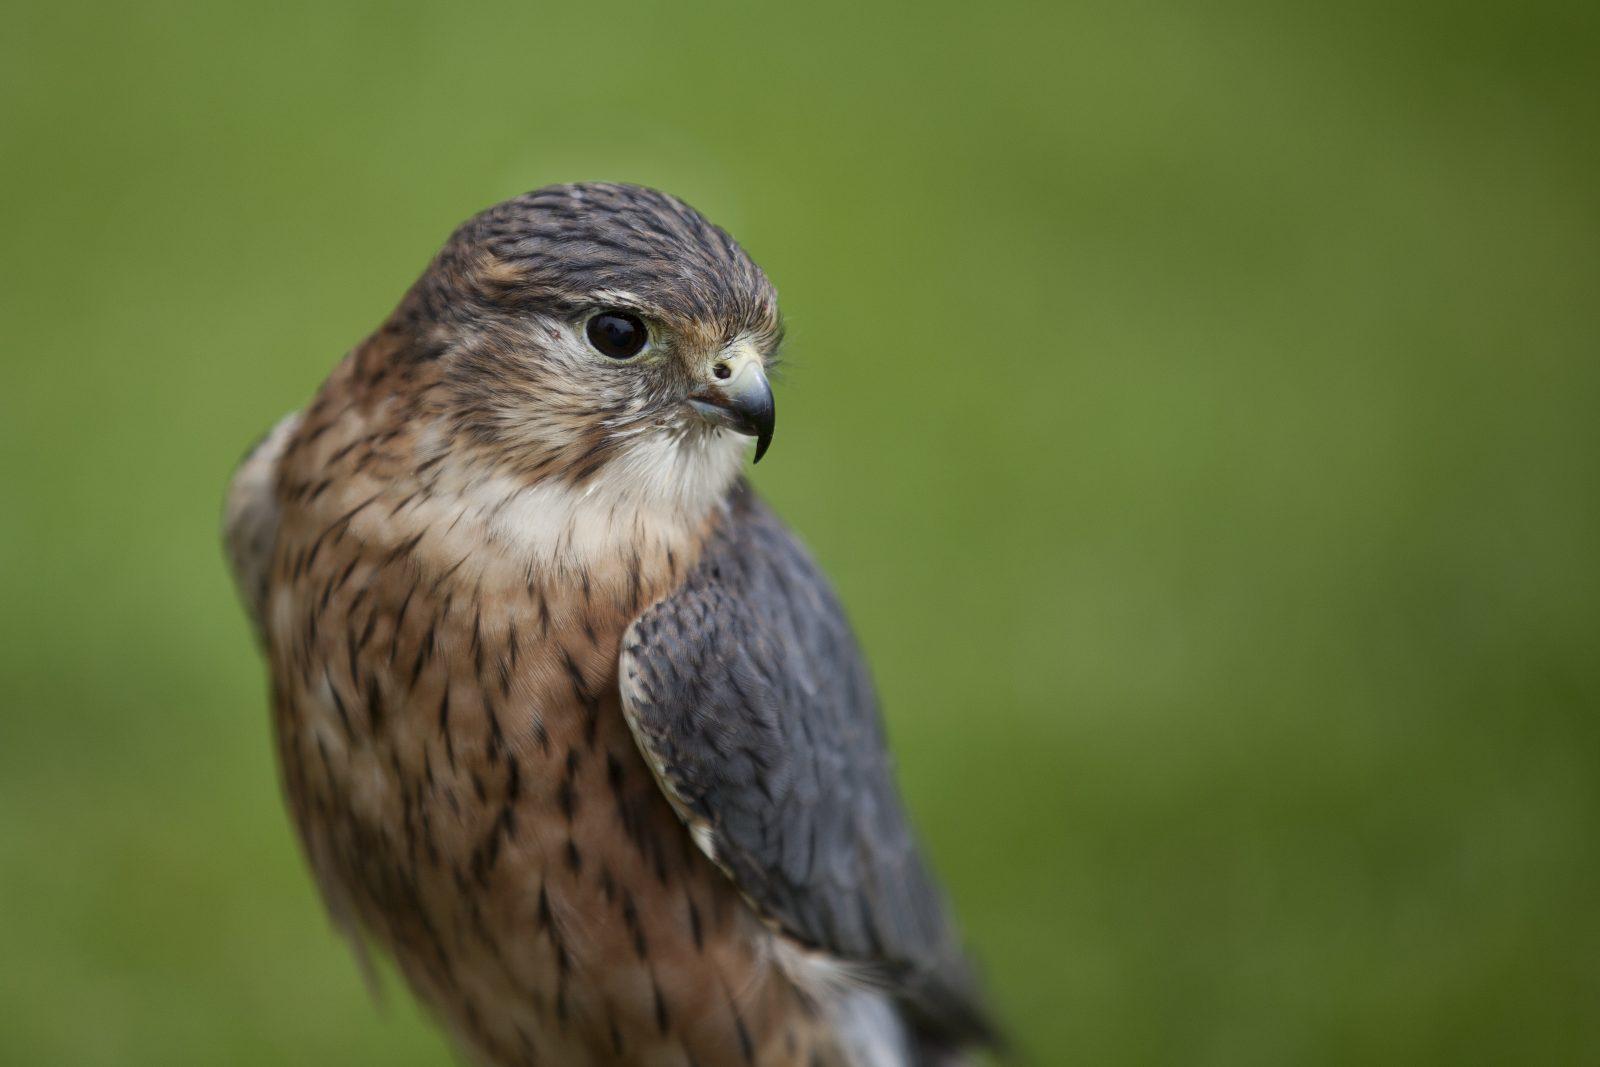 Following the falcon